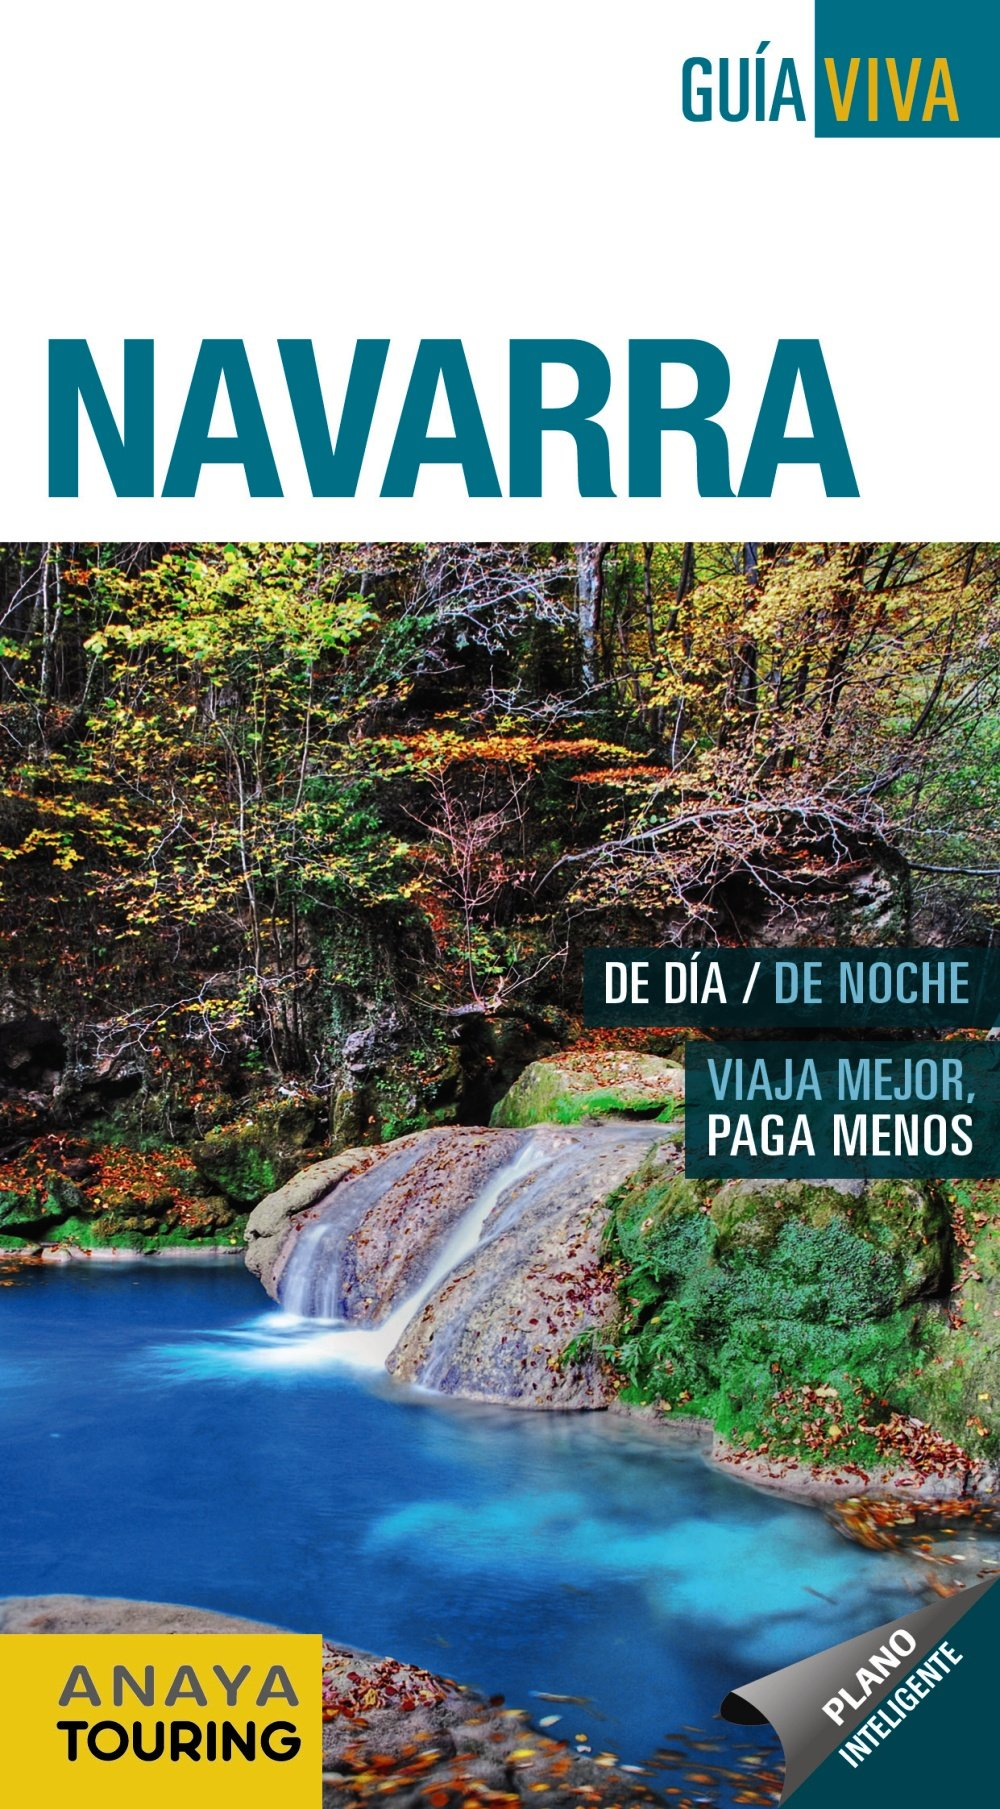 Navarra (Guía Viva - España): Amazon.es: Anaya Touring, Hernández Colorado, Arantxa, Gómez, Iñaki, Sahats, Legarra Carrera, Javier: Libros